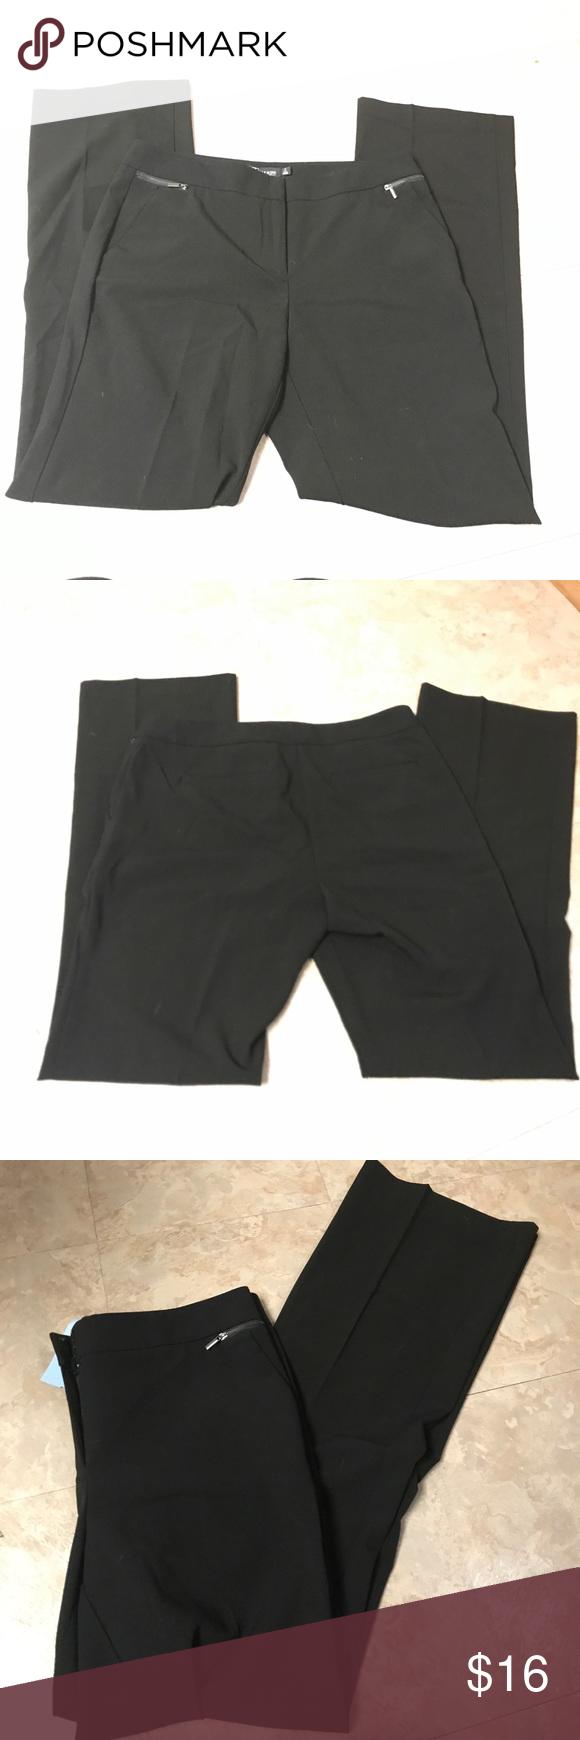 Ny Co Black Dress Pants Sz 10 Tall Black Dress Pants Dress Pants Clothes Design [ 1740 x 580 Pixel ]